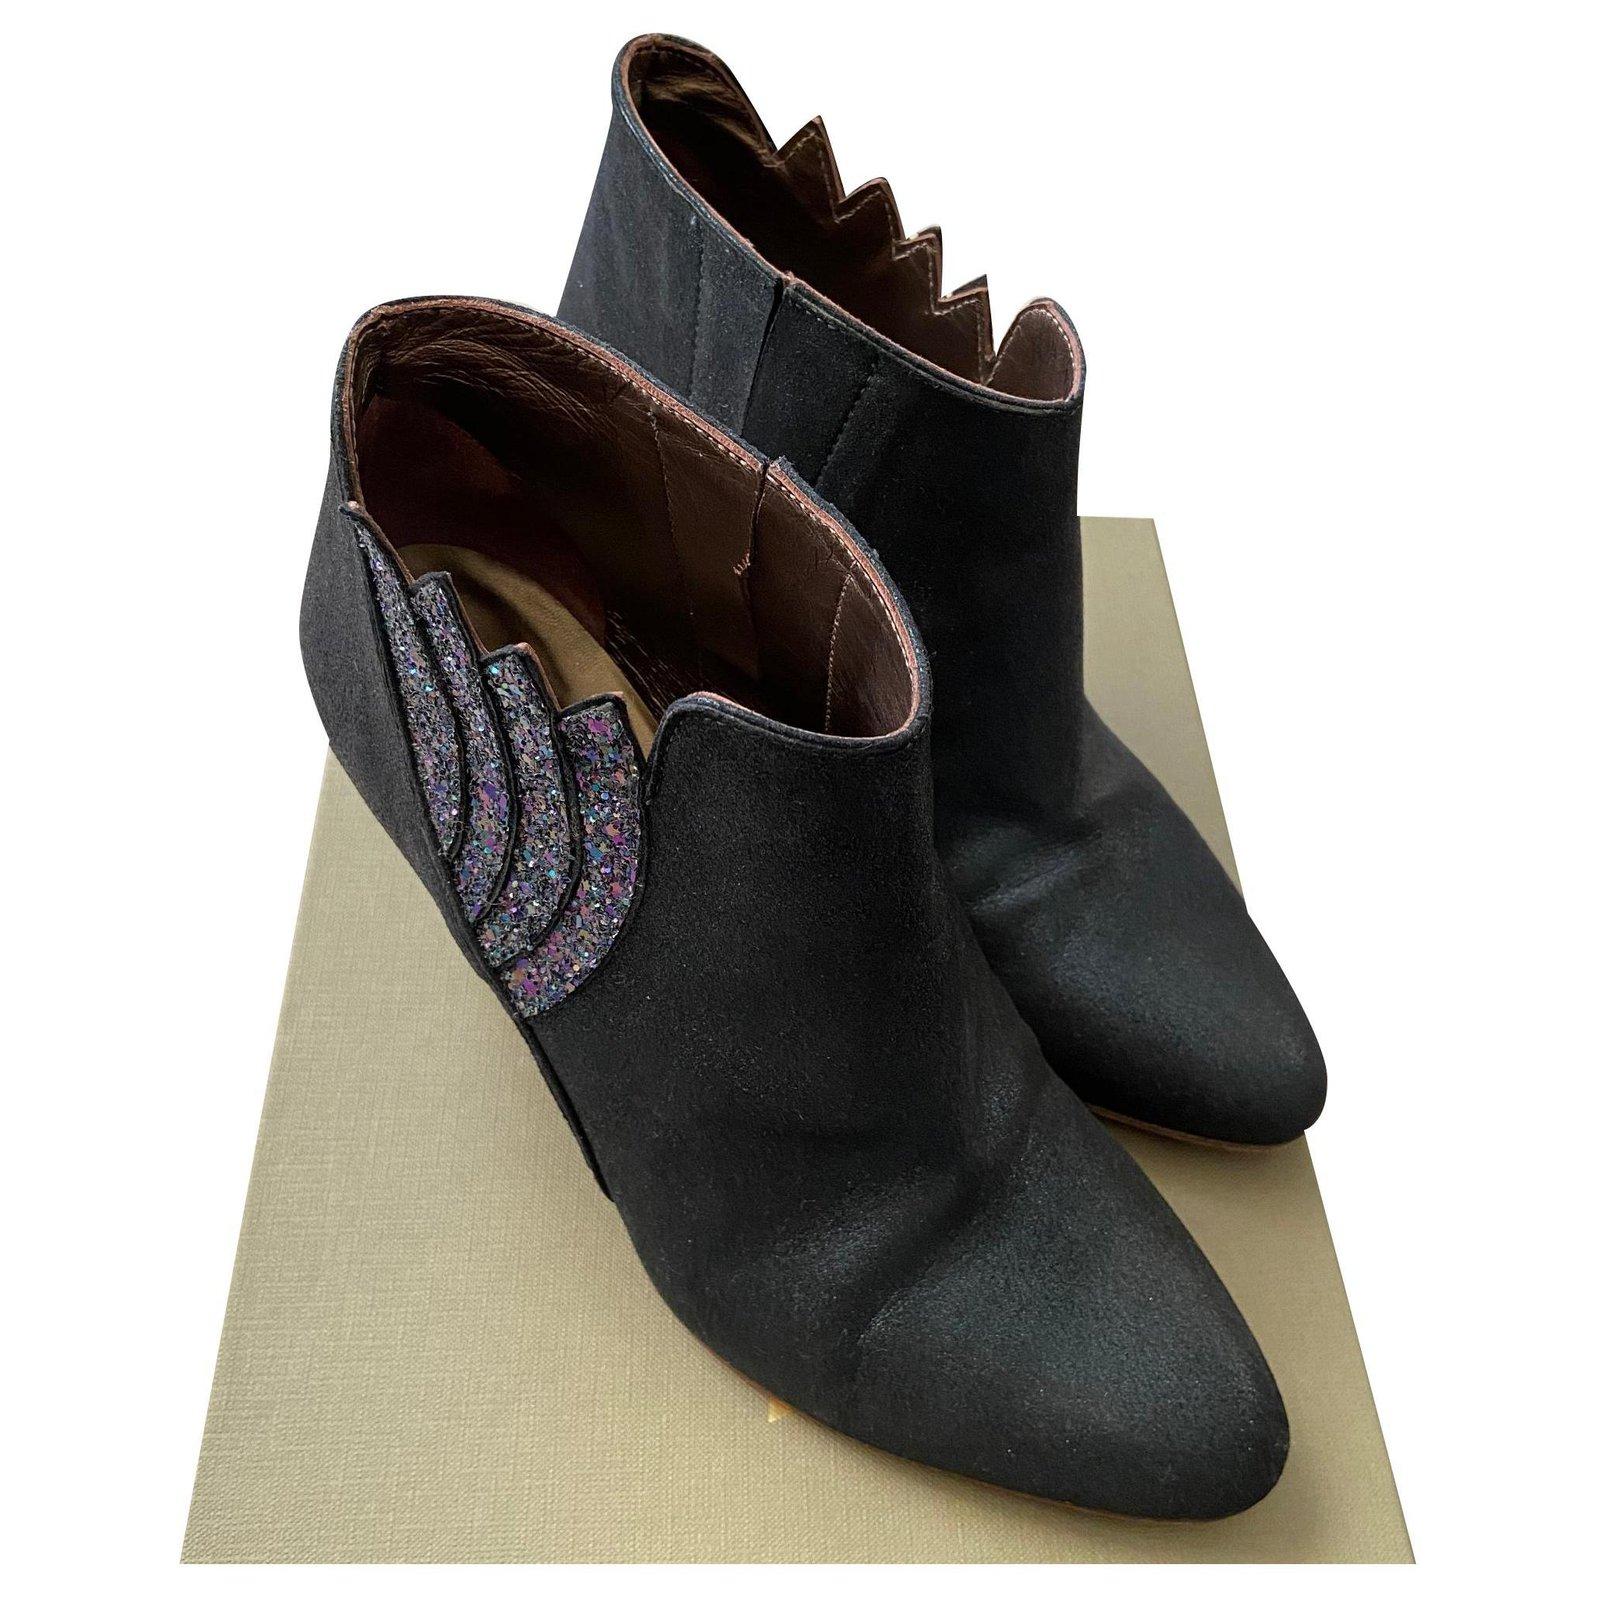 Bottines & low boots à talons PATRICIA BLANCHET Bleu, bleu